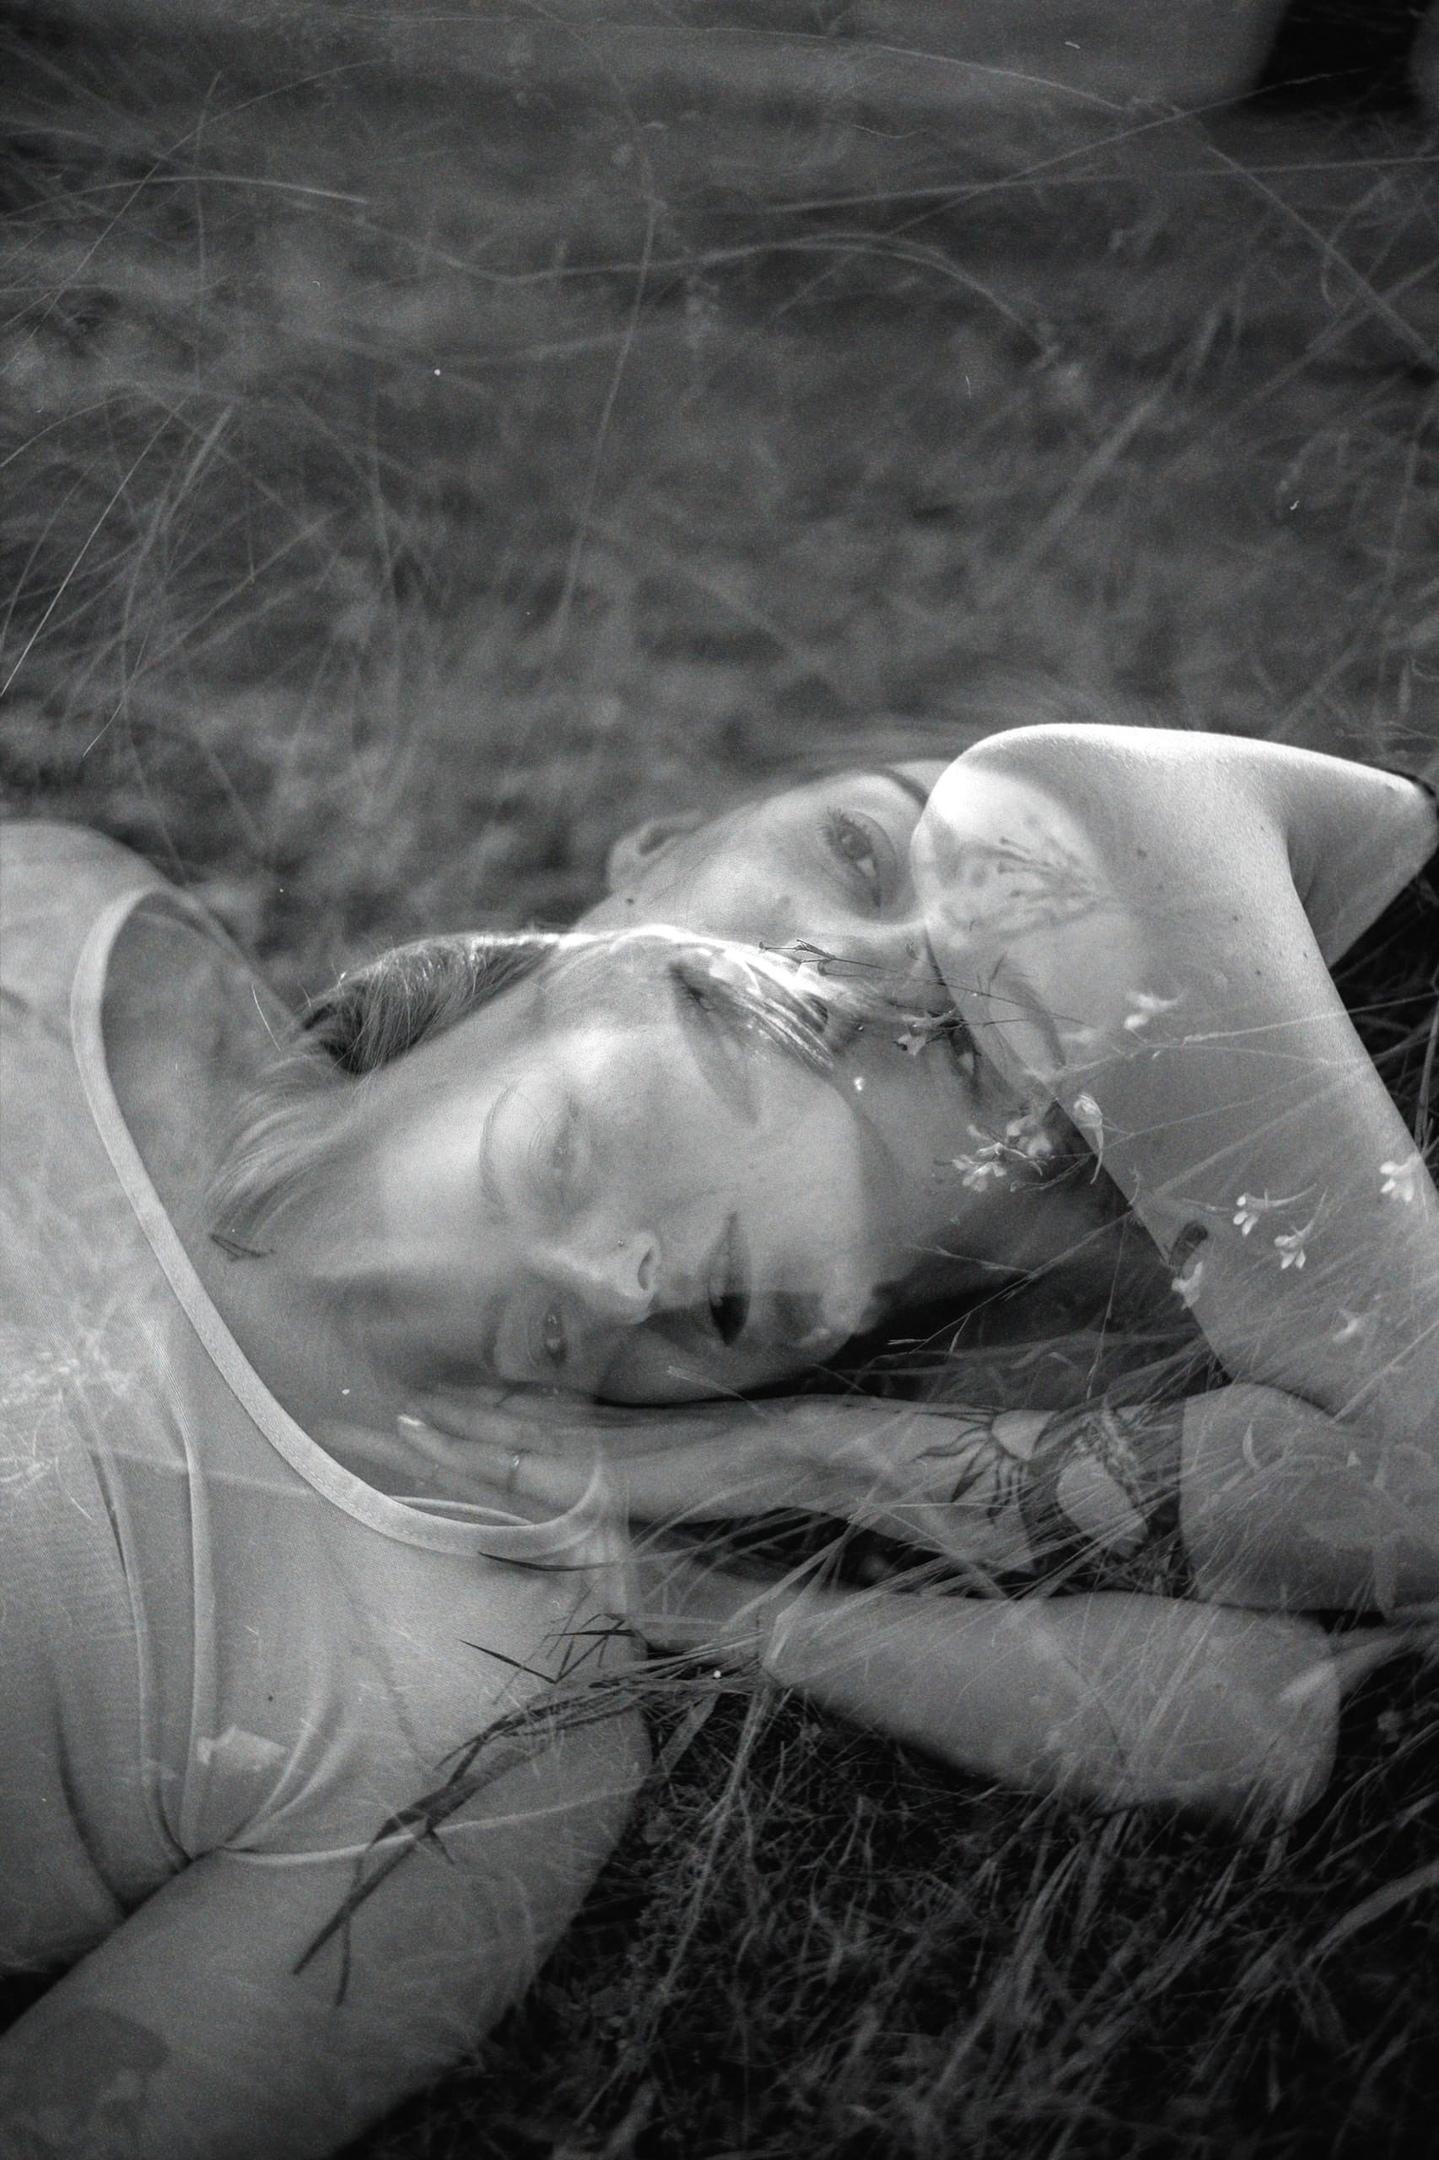 https://www.youngfolks.ru/pub/photographer-darina-bulgakova-113894